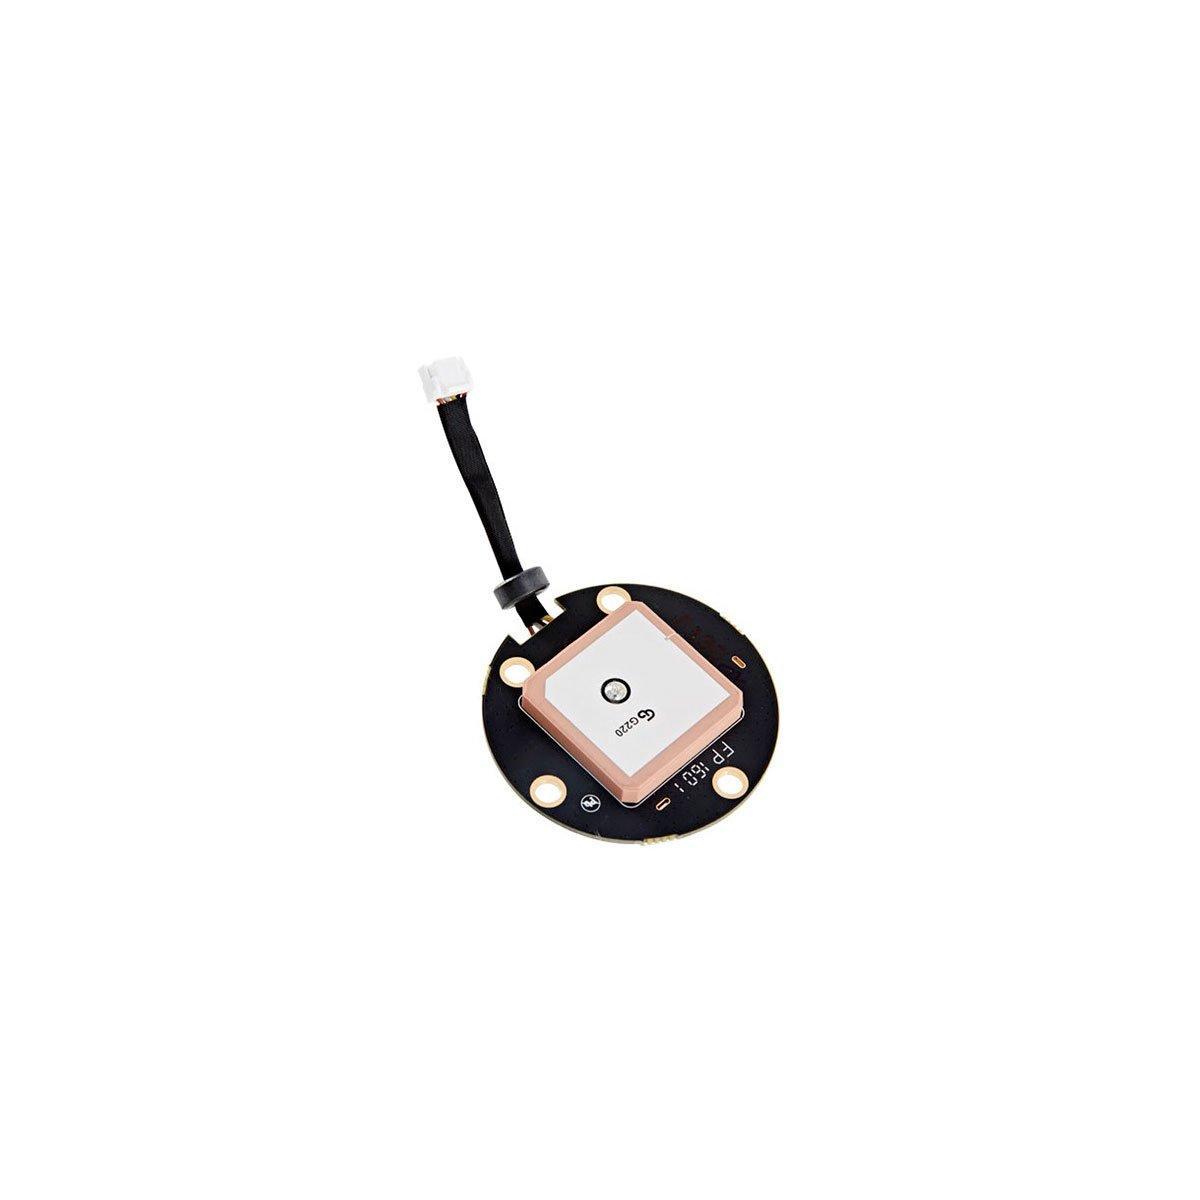 DJI Phantom 4 – GPS Module